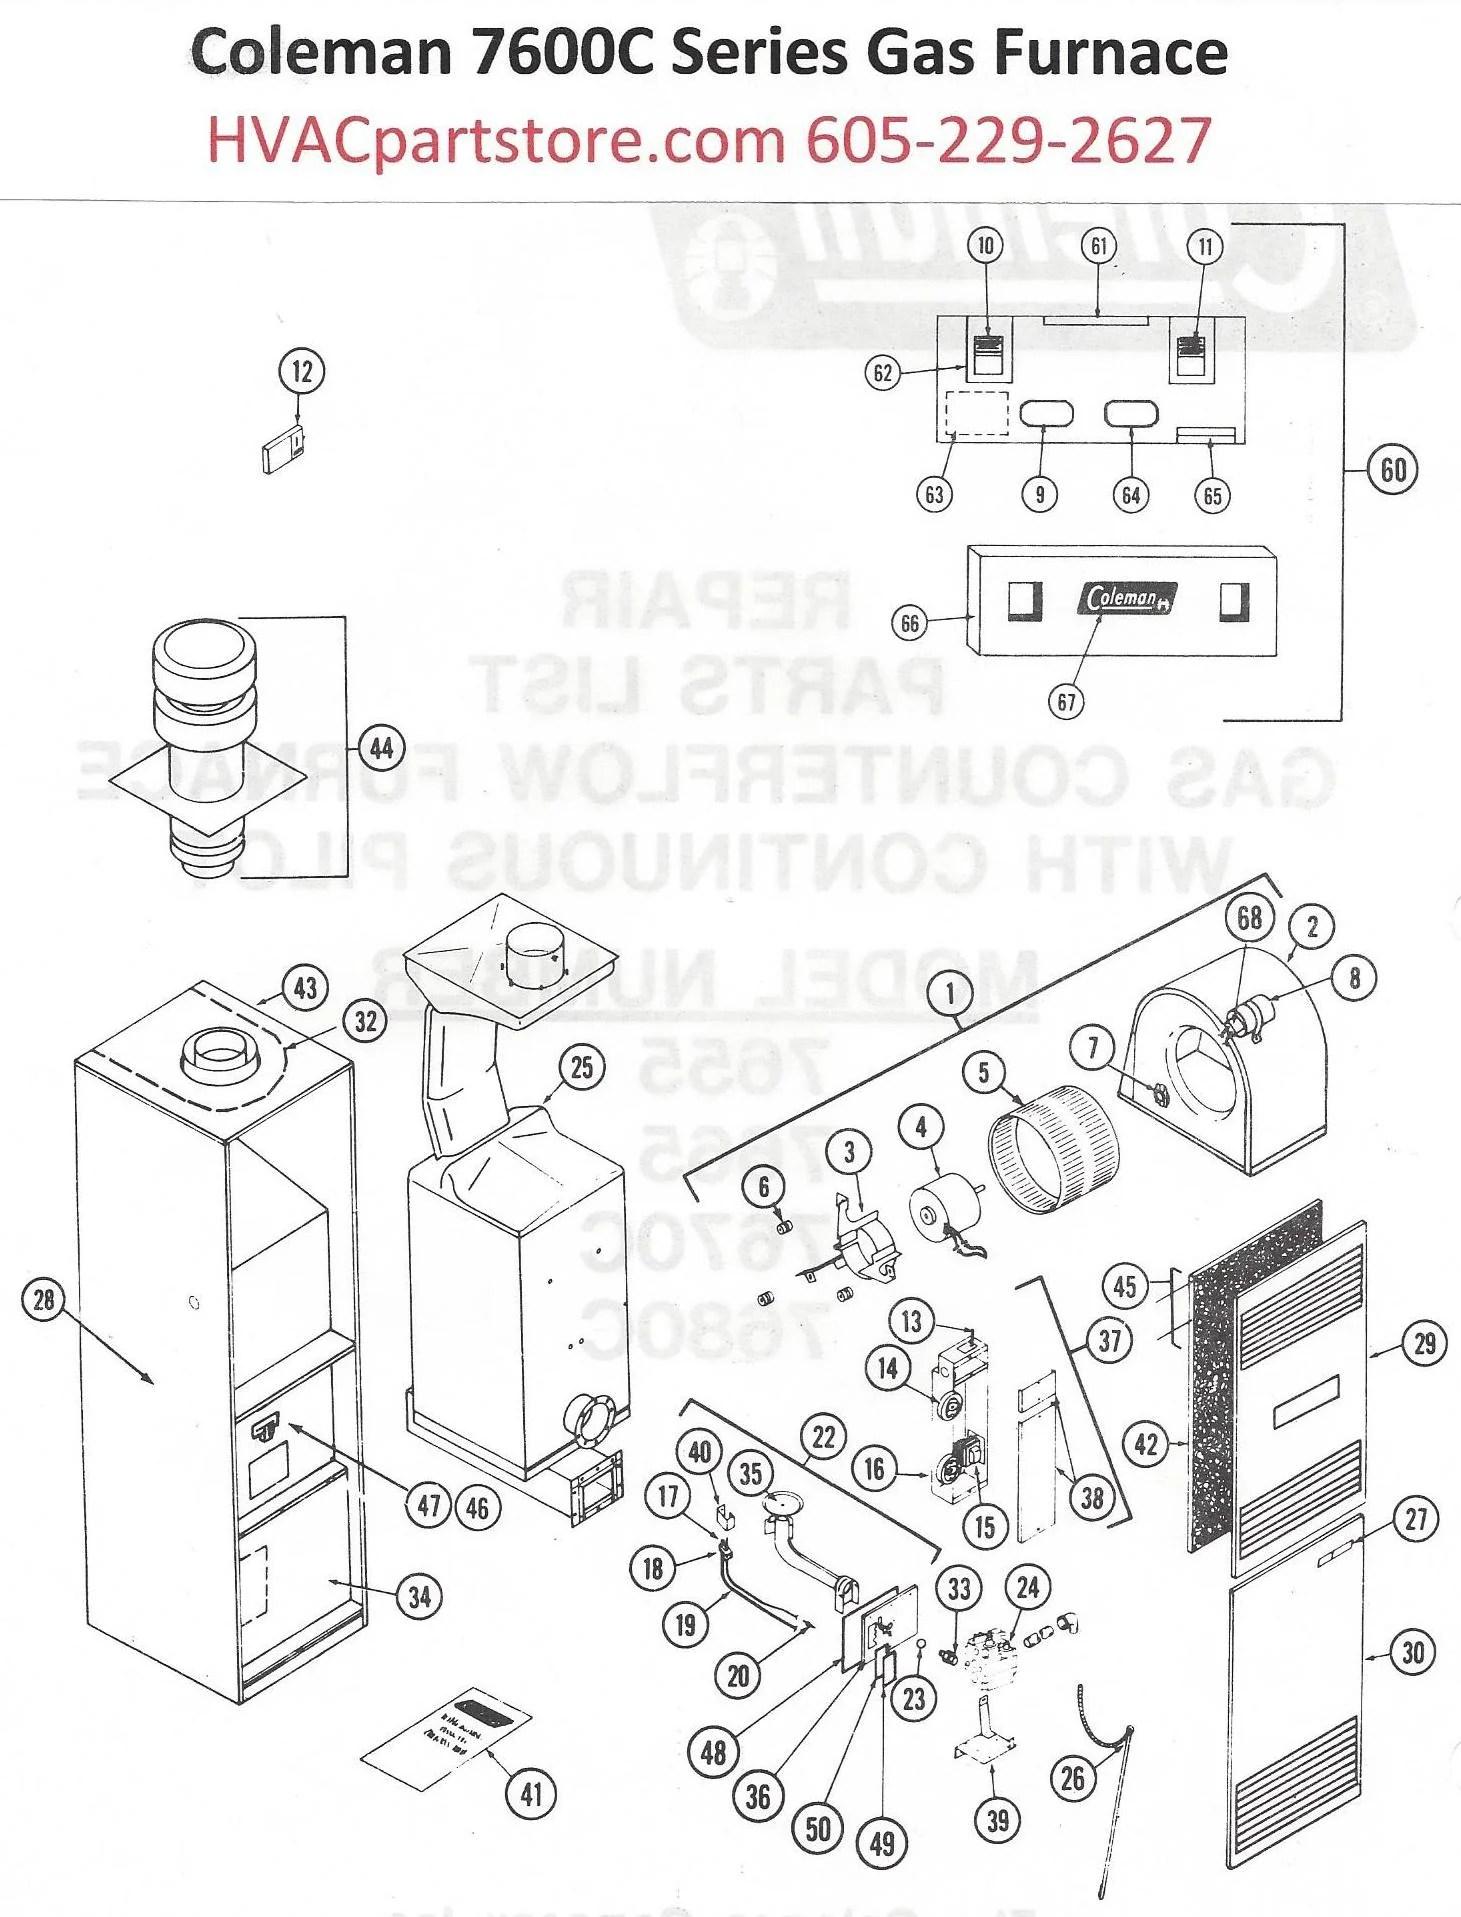 7670C856 Coleman Gas Furnace Parts – HVACpartstore